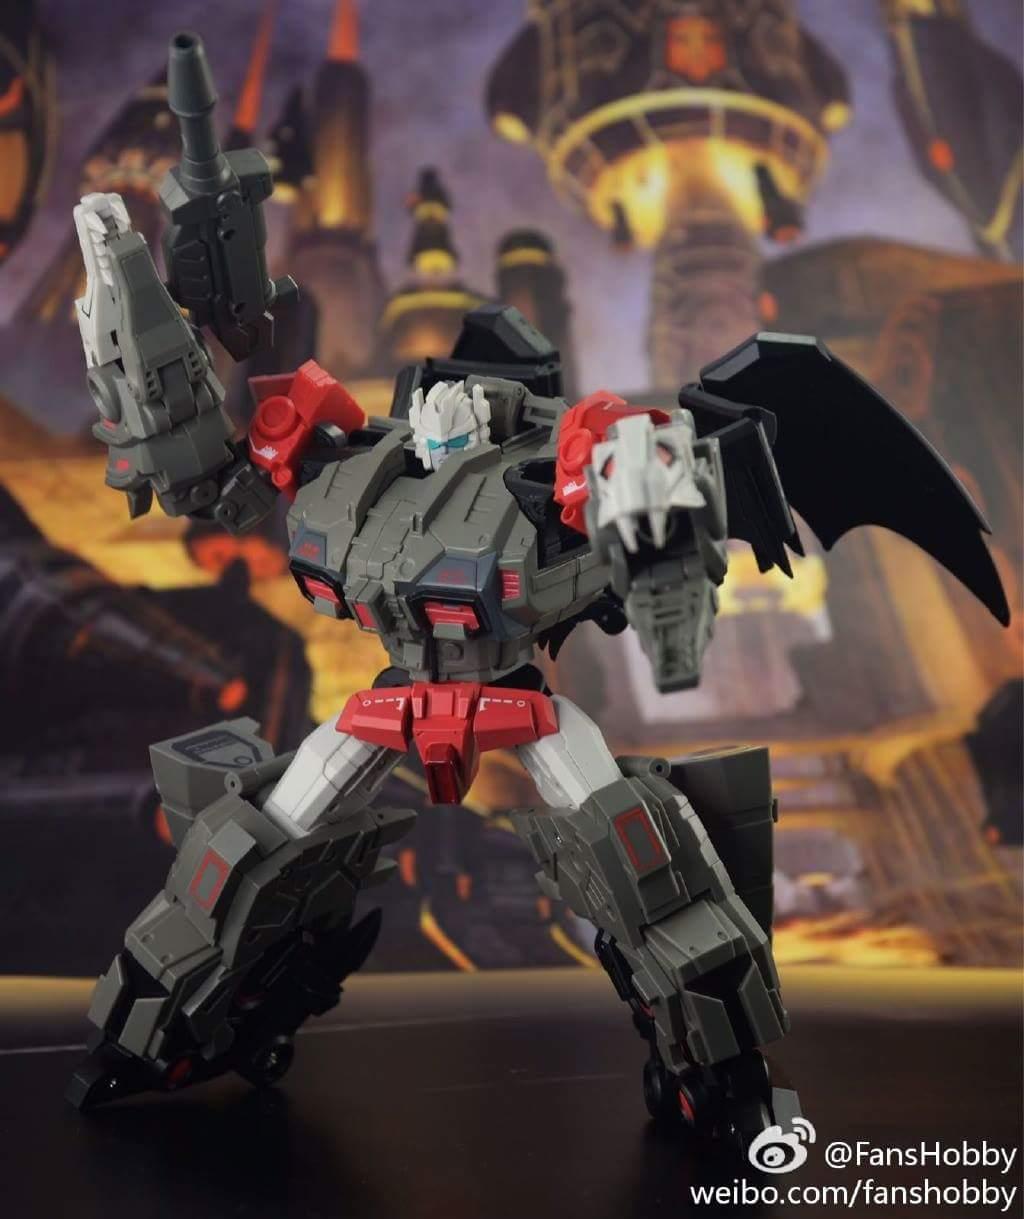 [FansHobby] Produit Tiers - Master Builder MB-02/03/05 - aka Monsterbots/Monstrebots - Page 2 DmgeG2Es